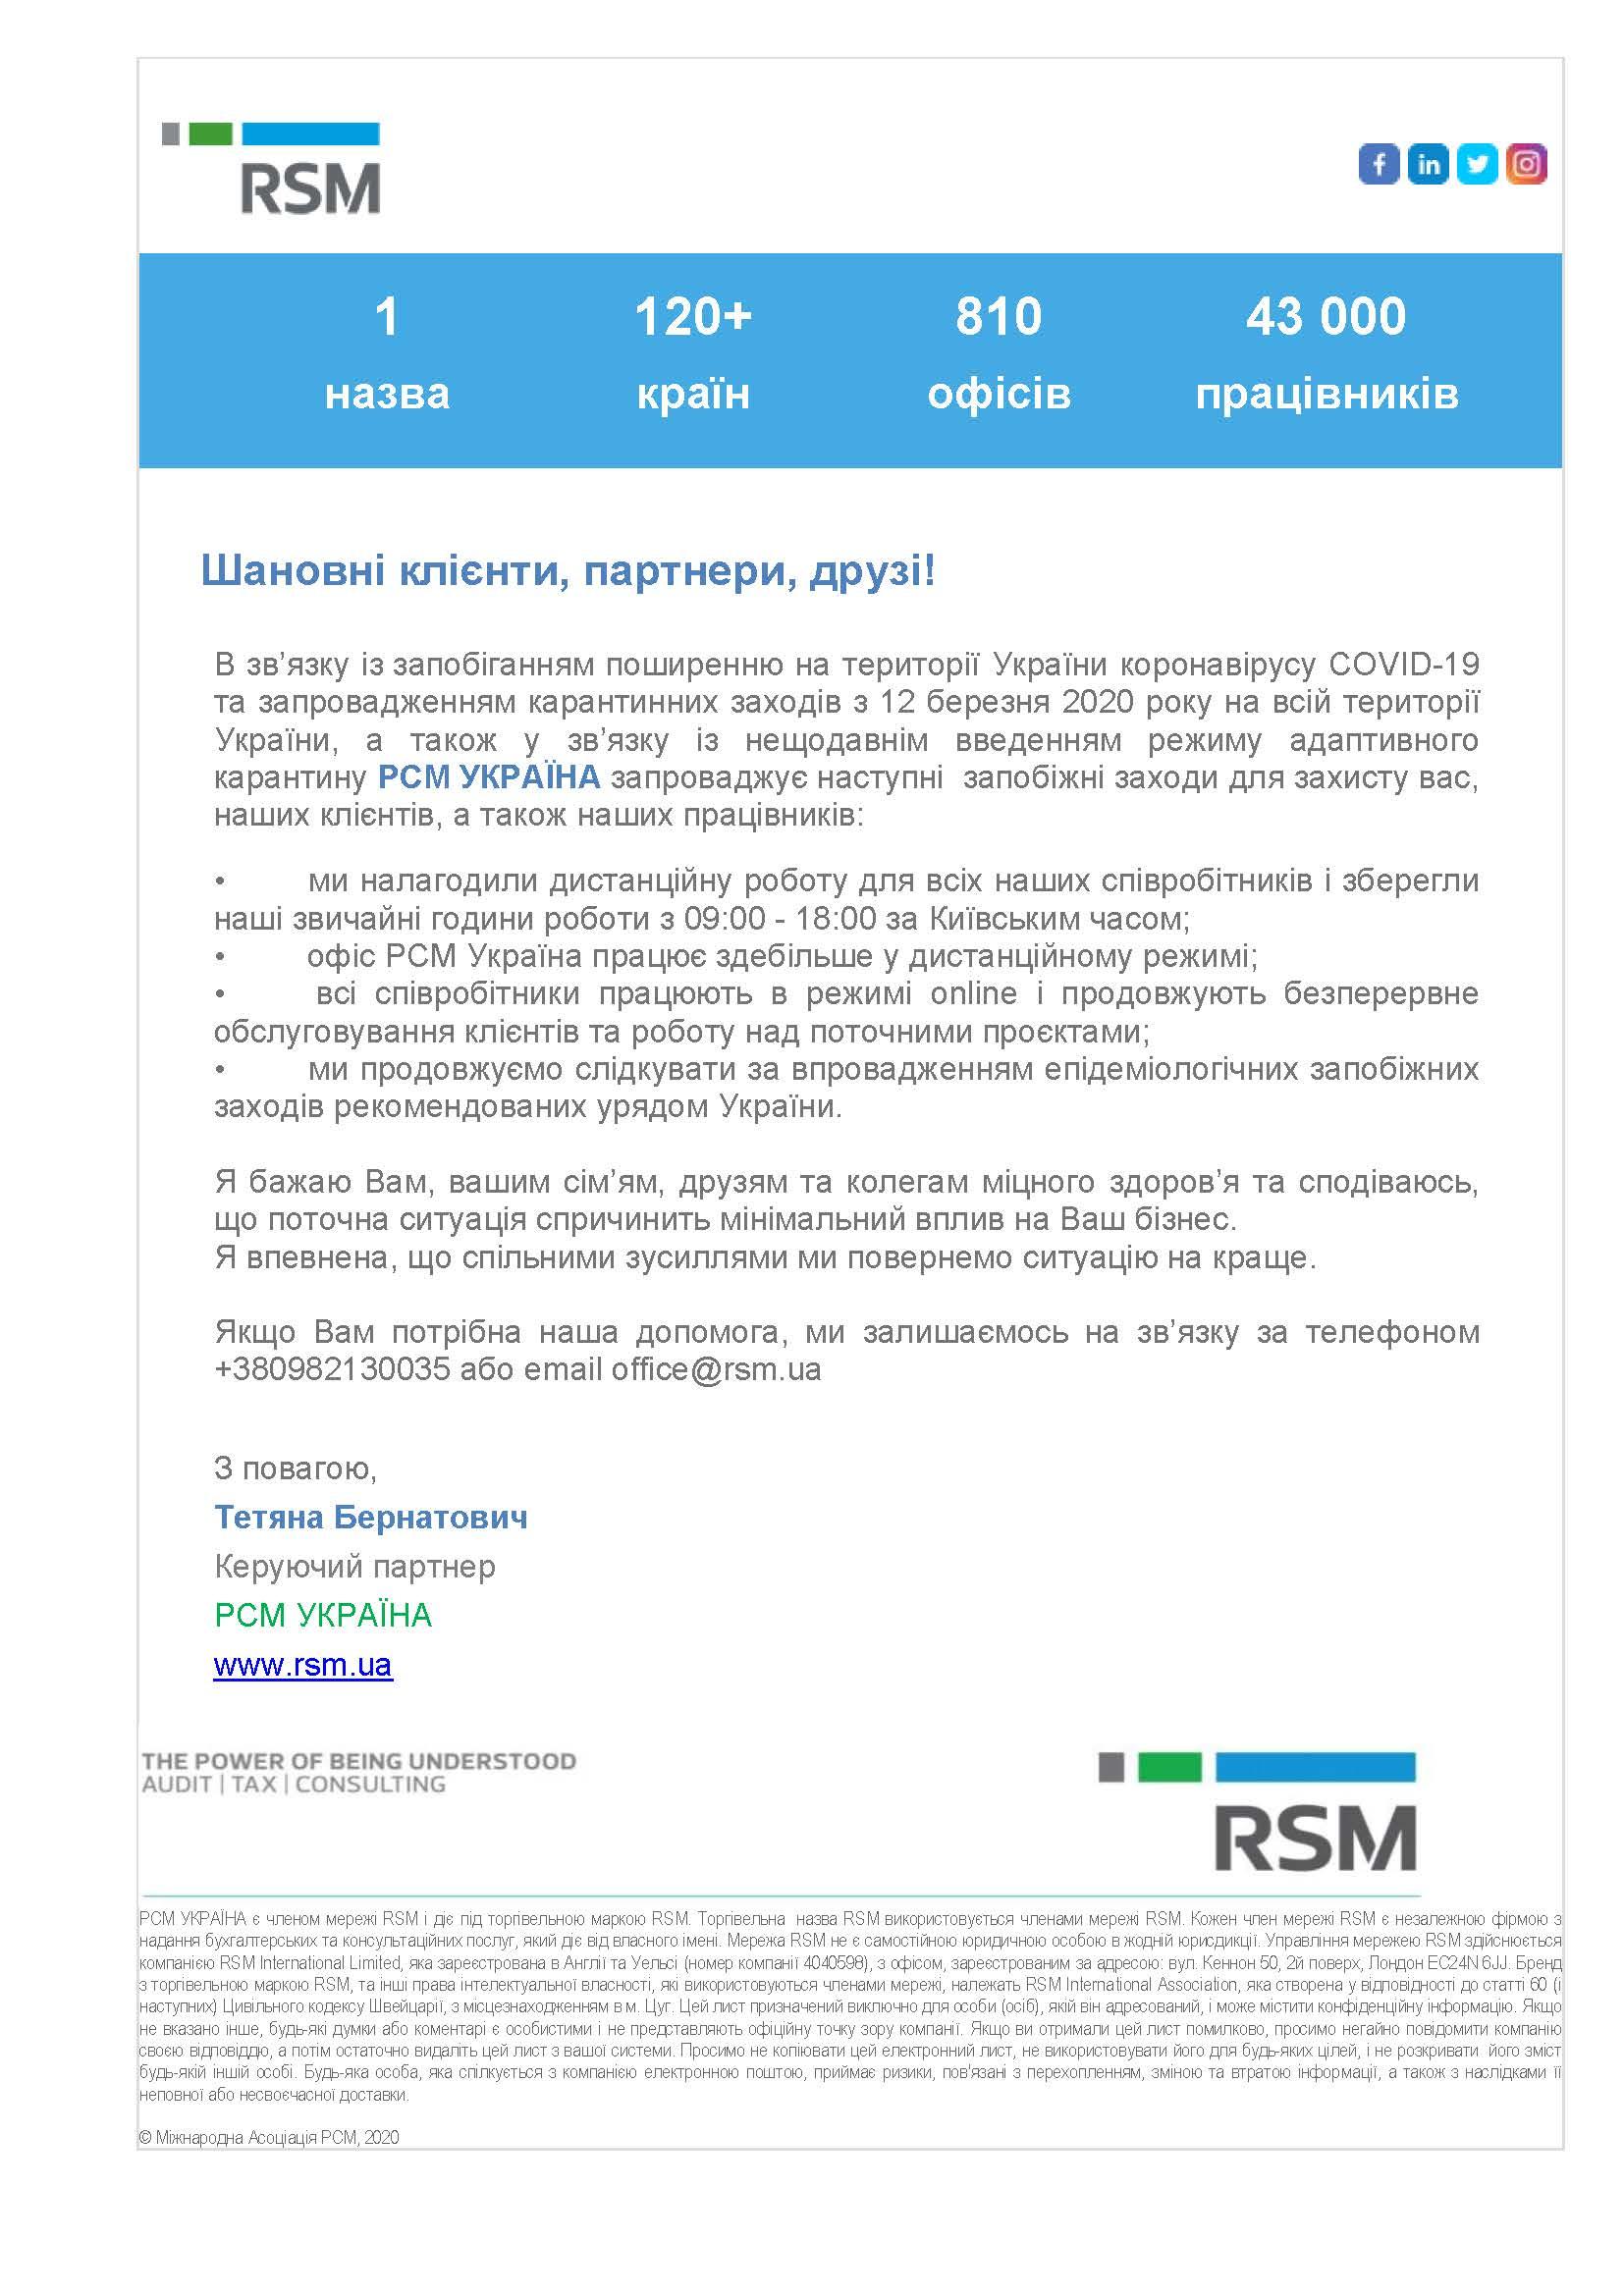 rsm_ukraine_announcements_ukr_bez_daty.jpg